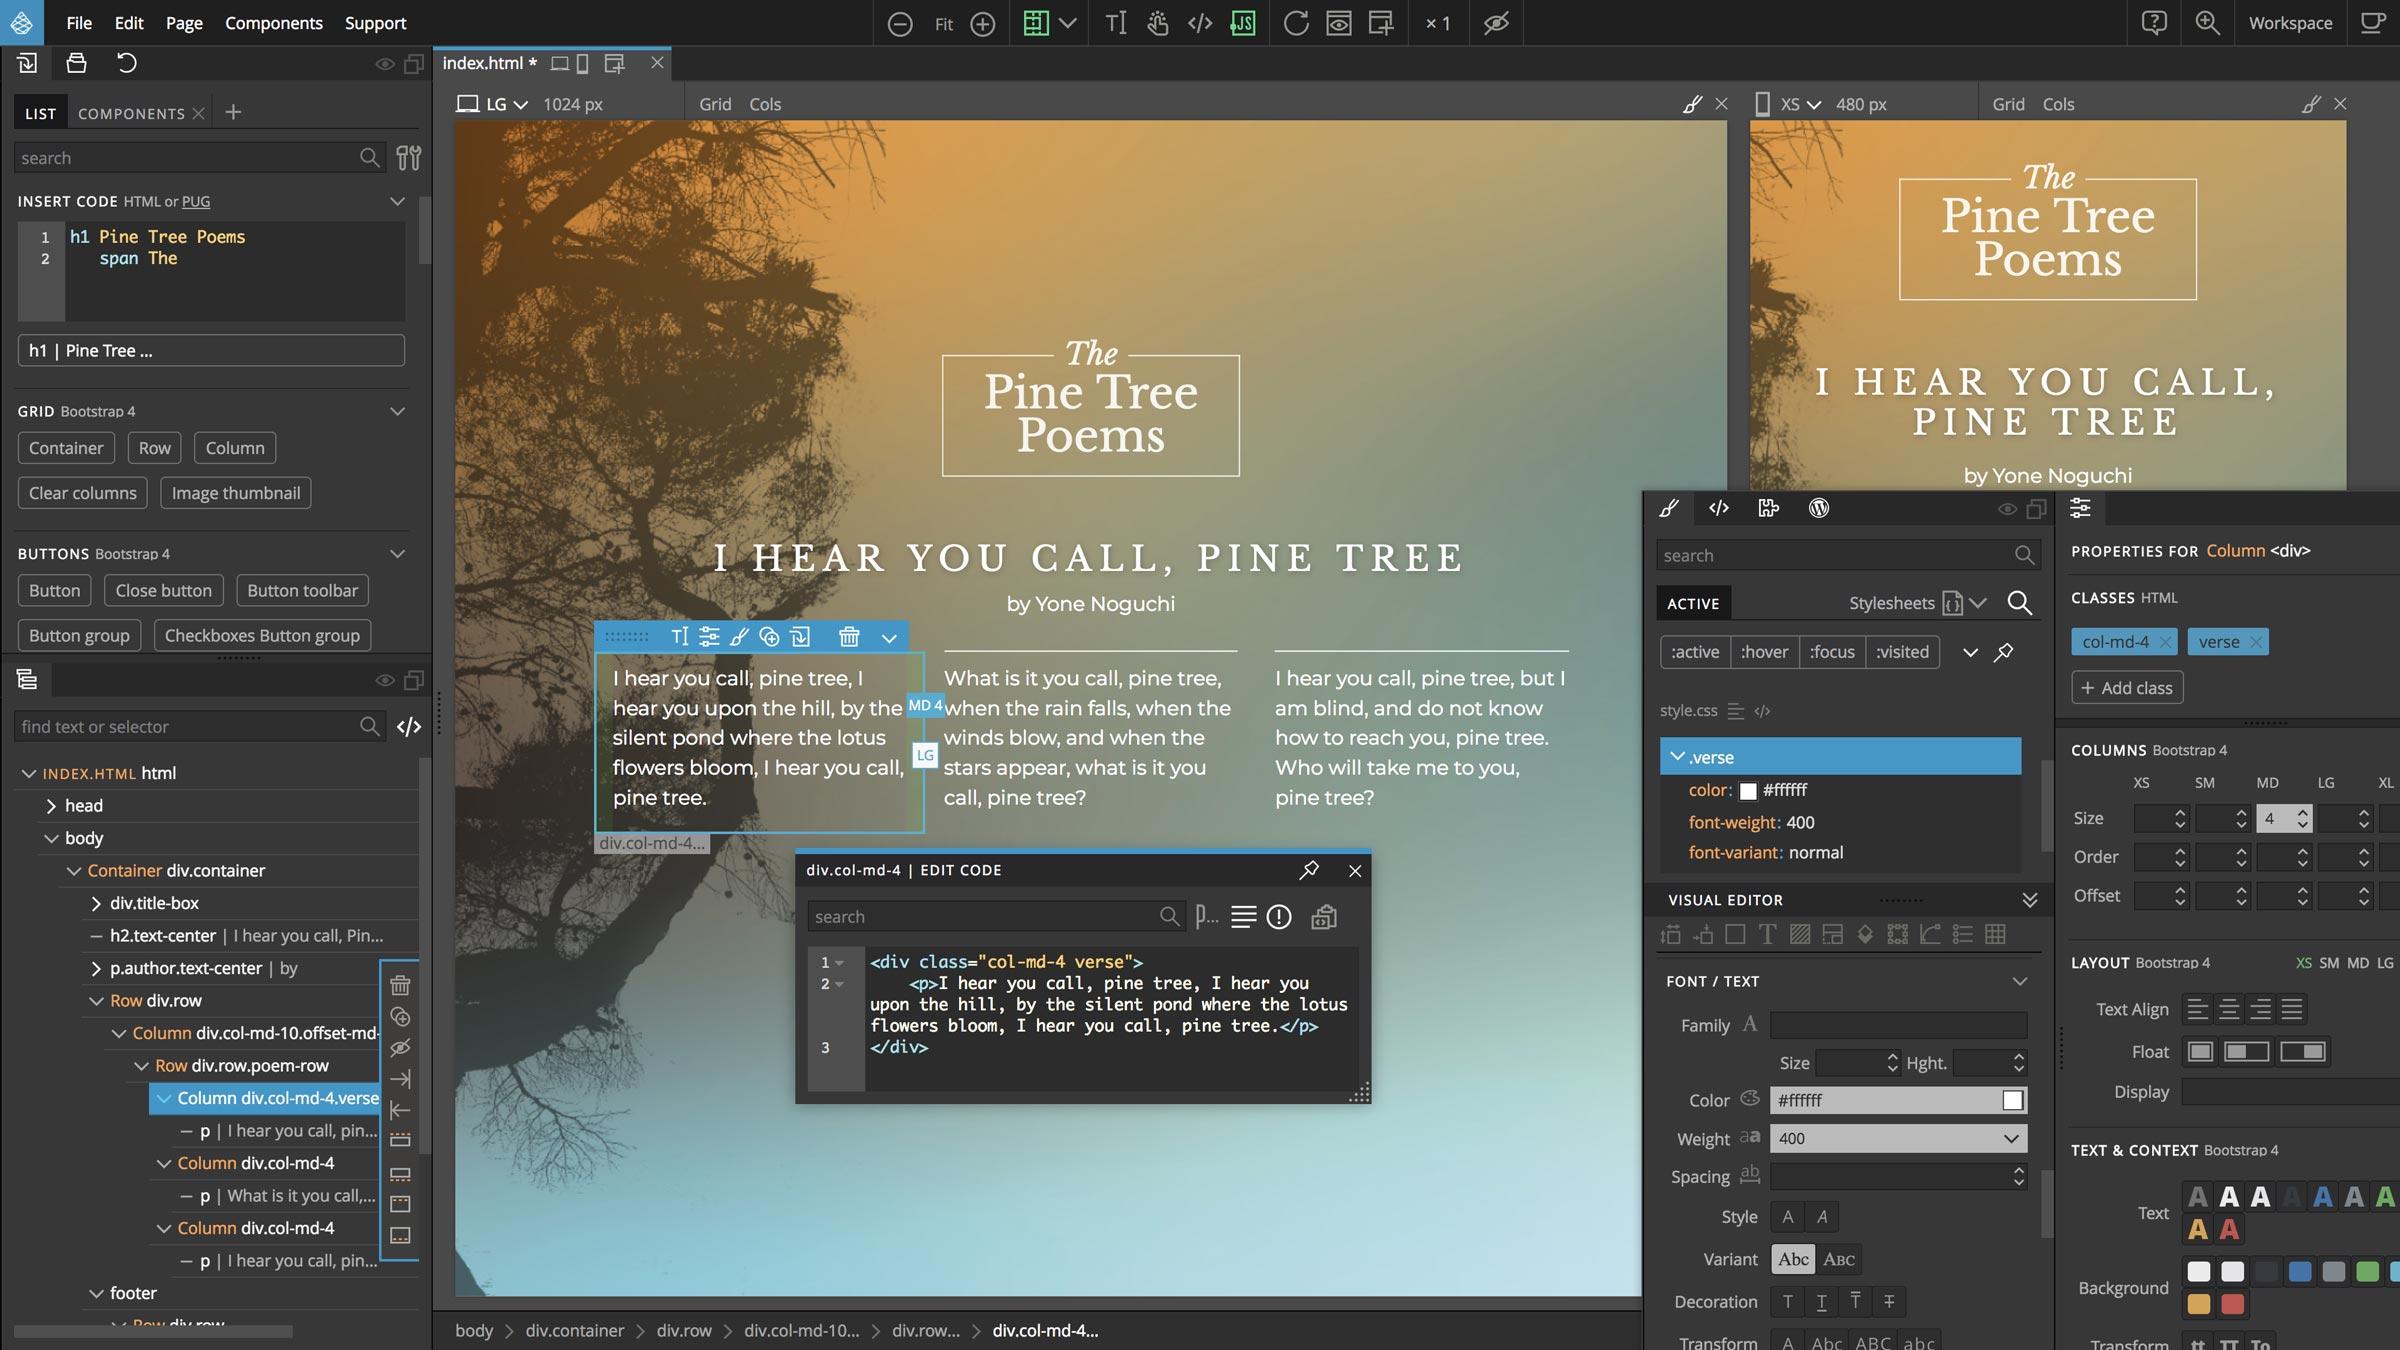 Humane Technologies Pinegrow Web Editor Pro 5.41